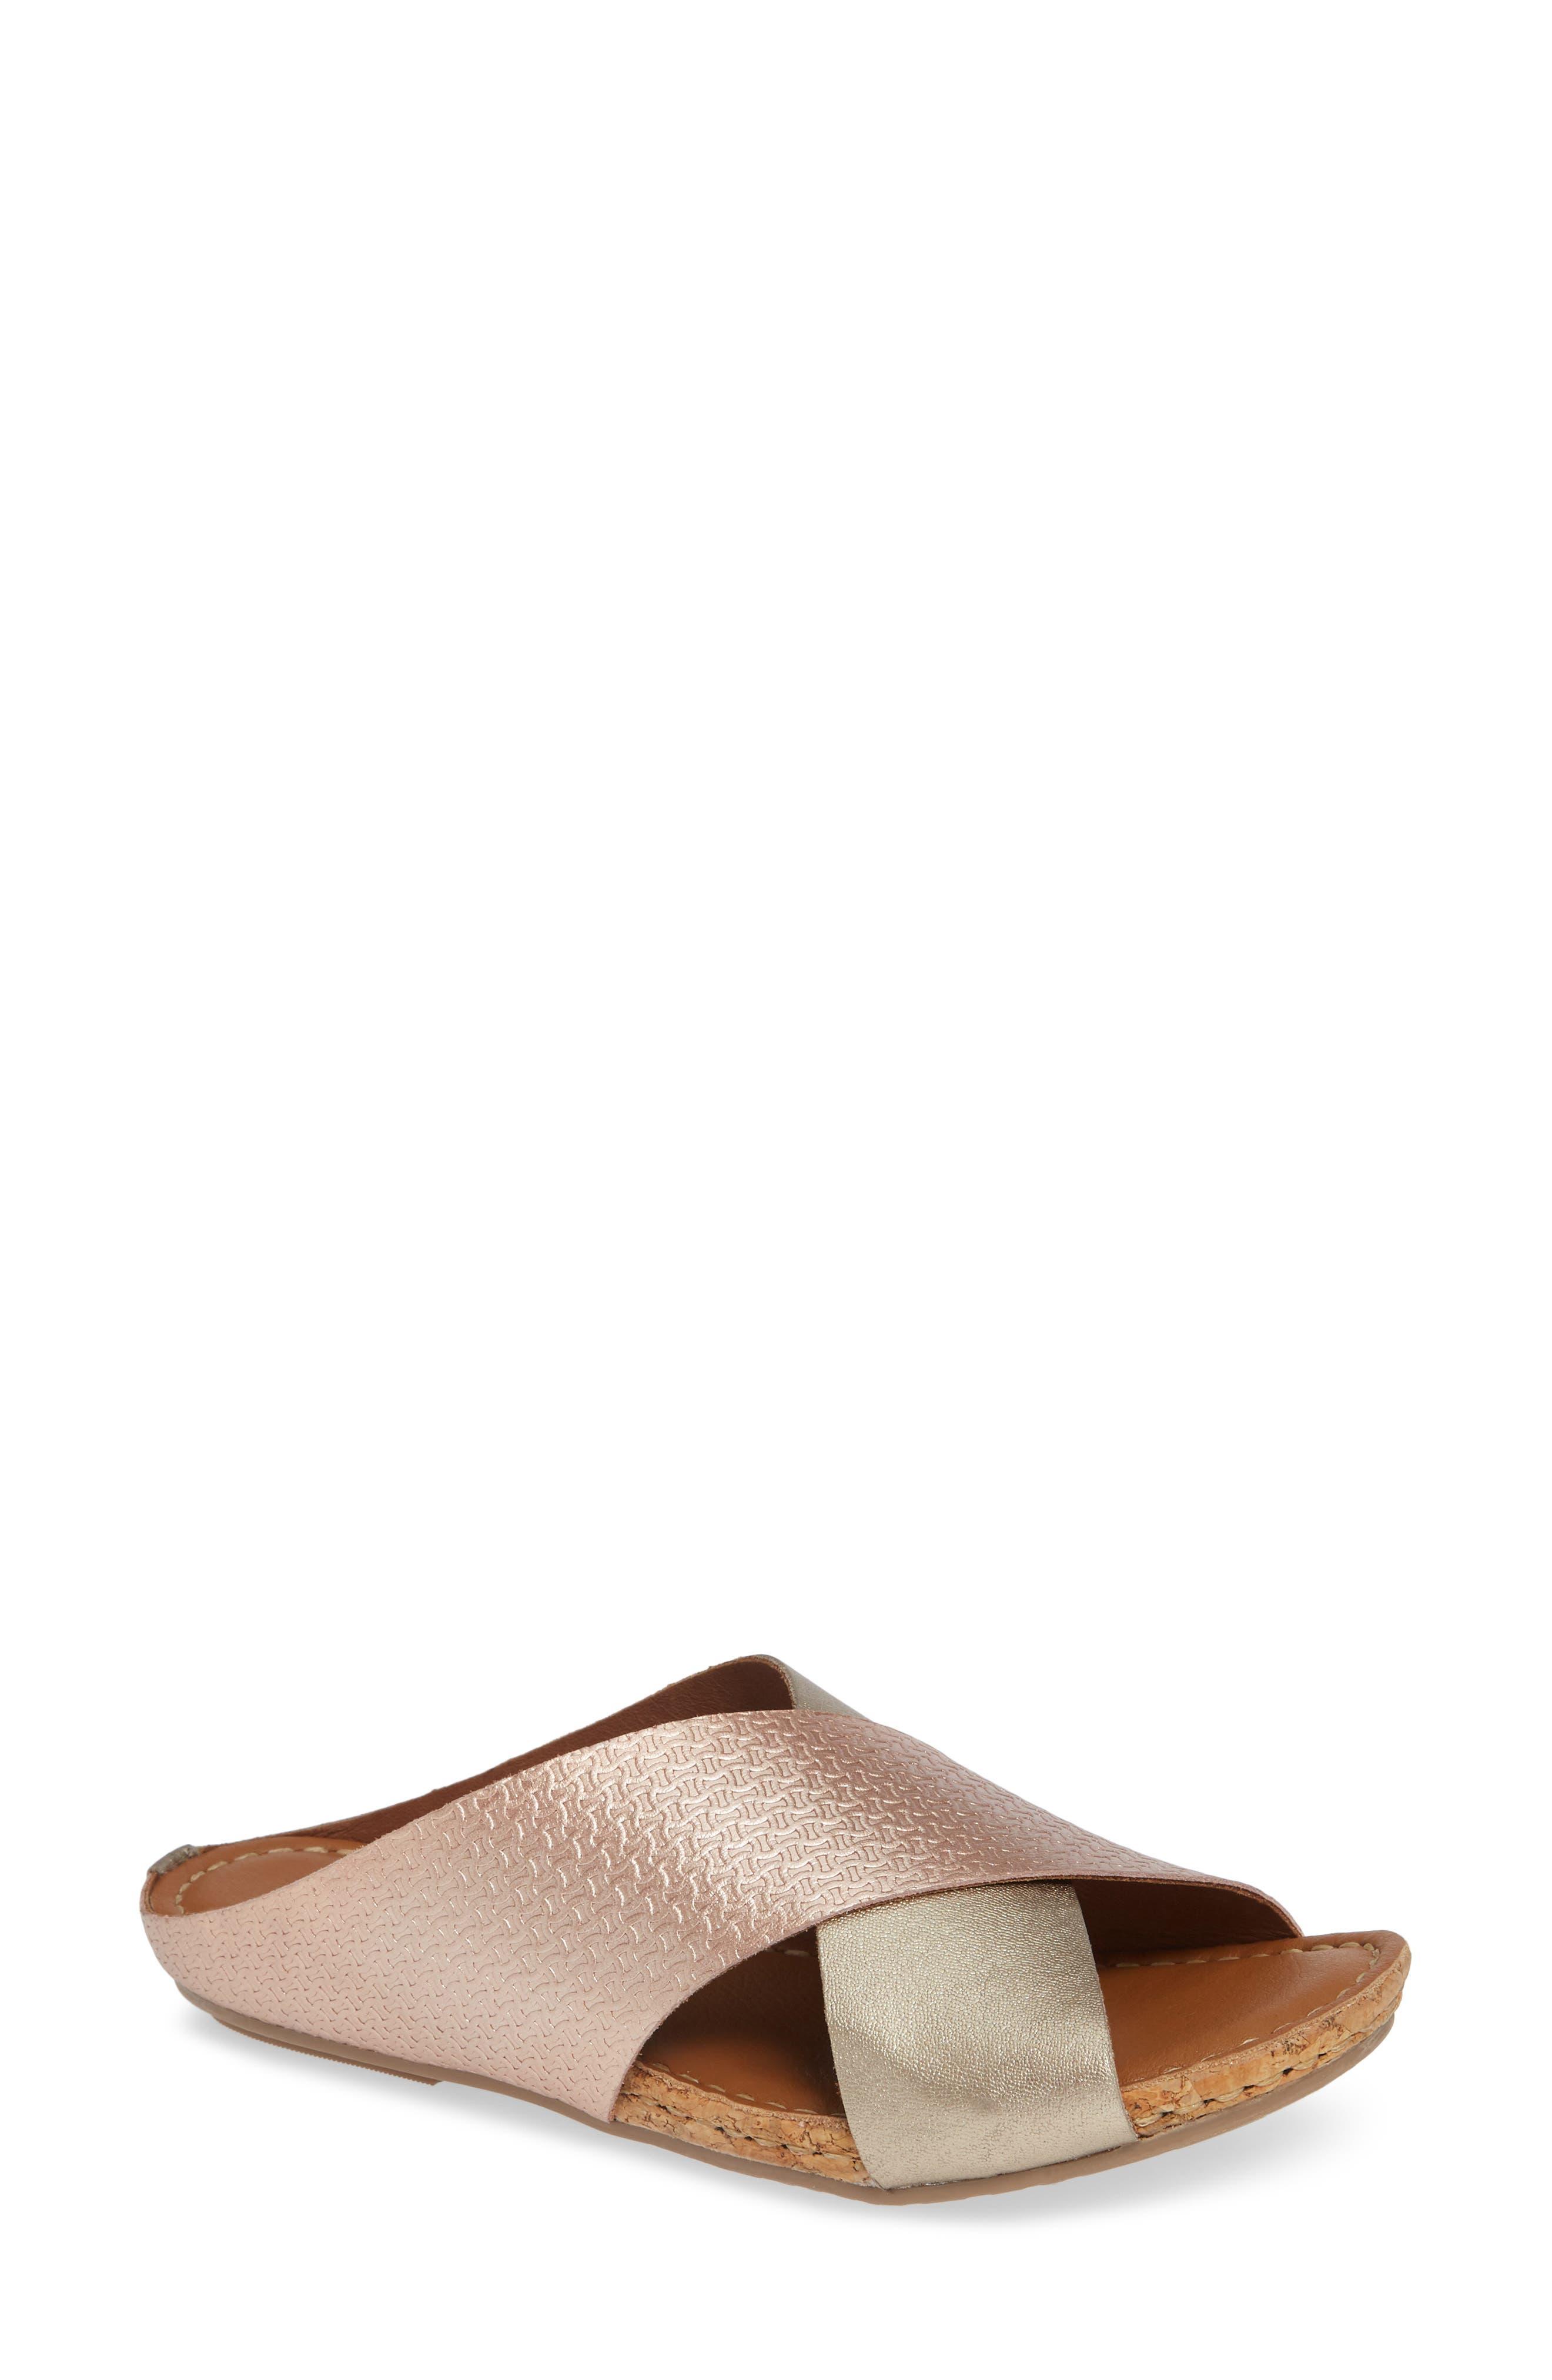 Klub Nico Gricia Slide Sandal, Pink